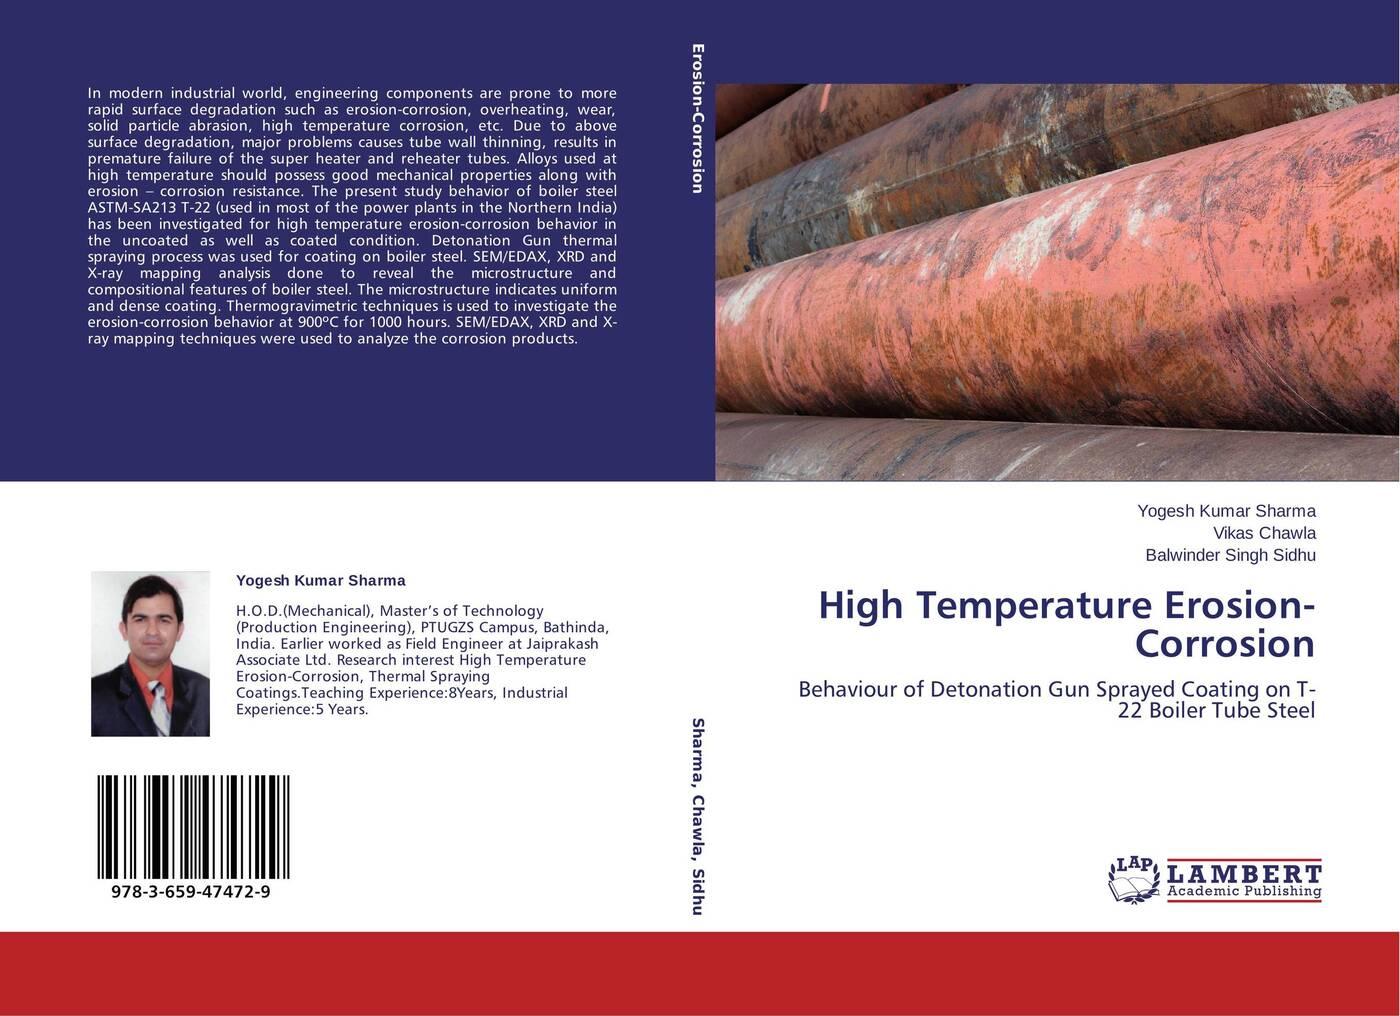 лучшая цена Yogesh Kumar Sharma,Vikas Chawla and Balwinder Singh Sidhu High Temperature Erosion-Corrosion